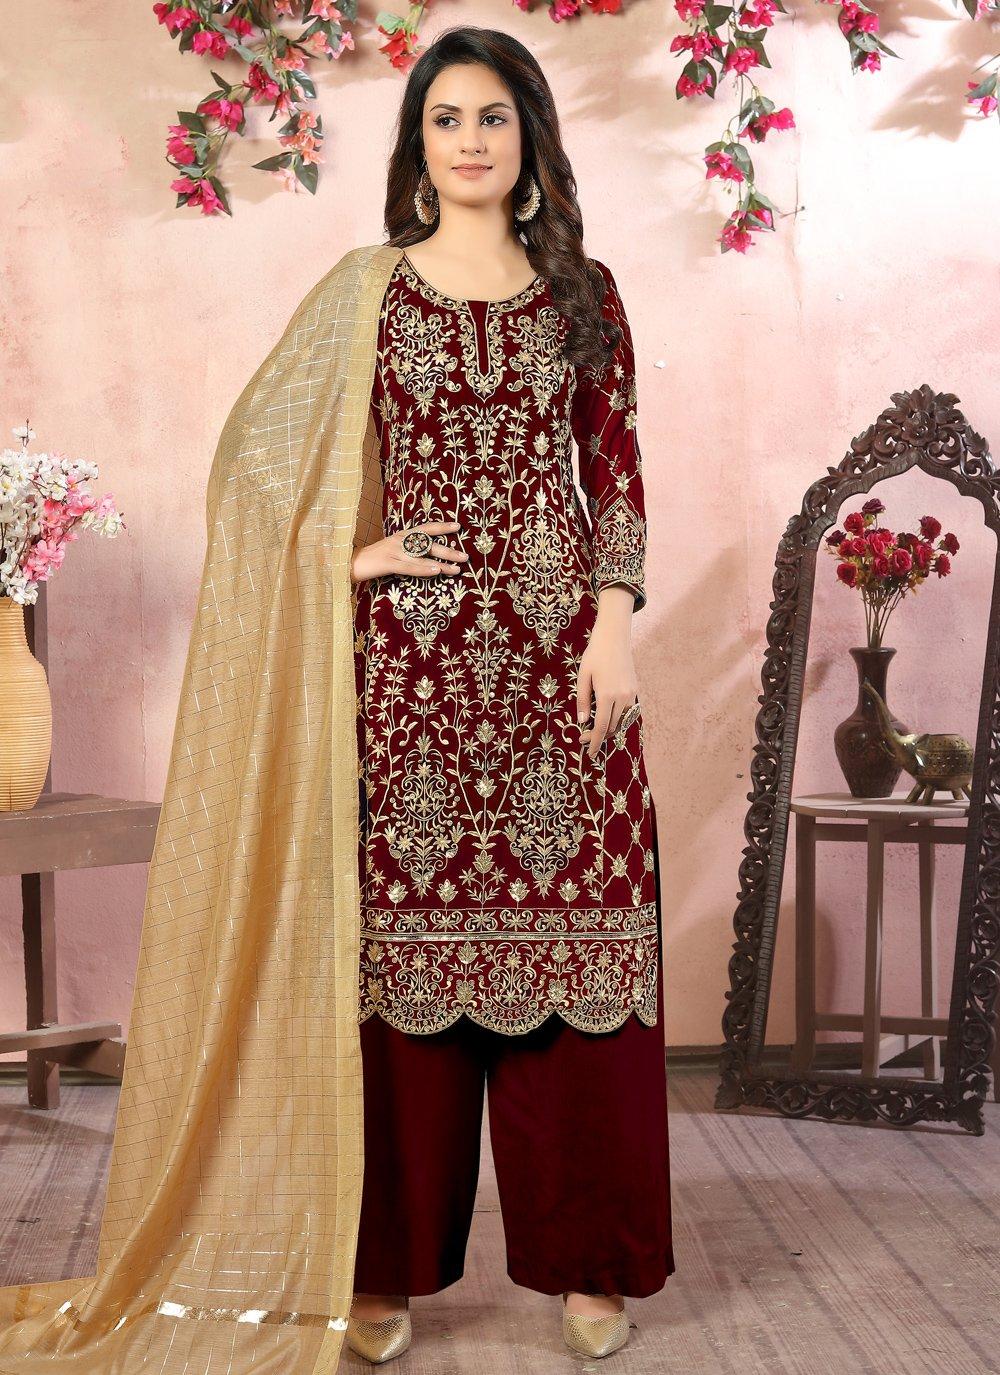 Maroon Faux Georgette Embroidered Bollywood Salwar Kameez